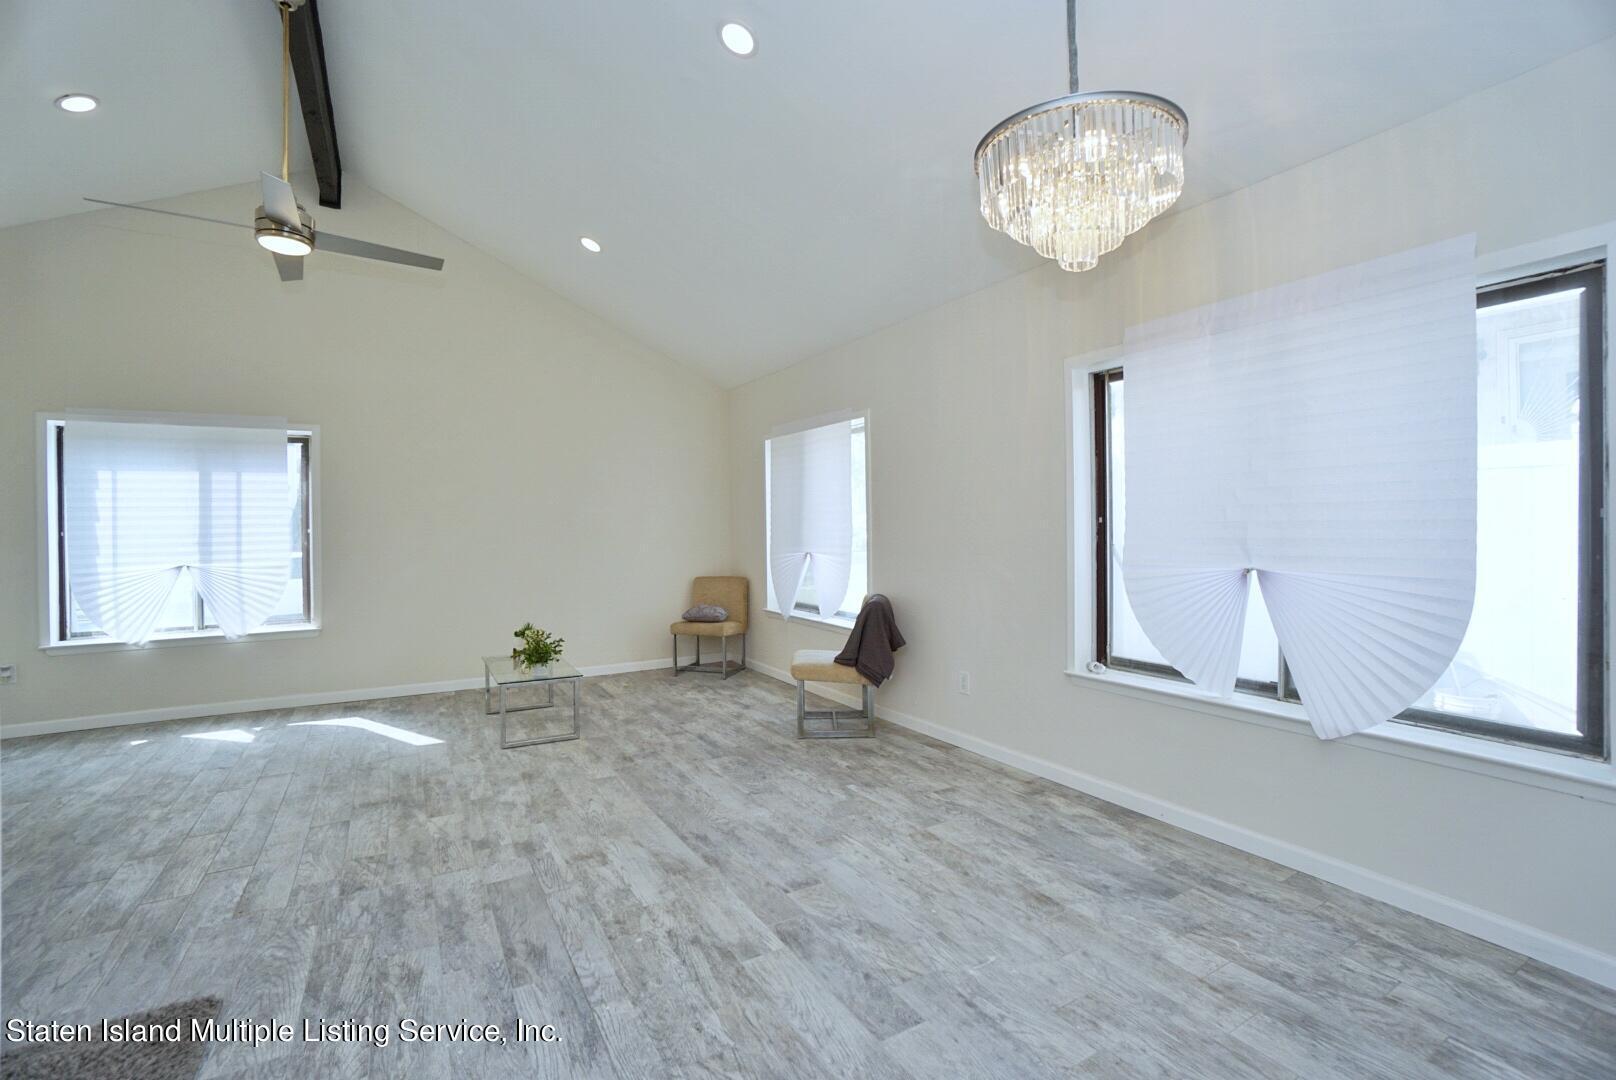 Single Family - Detached 83 Boylan Street  Staten Island, NY 10312, MLS-1149266-3